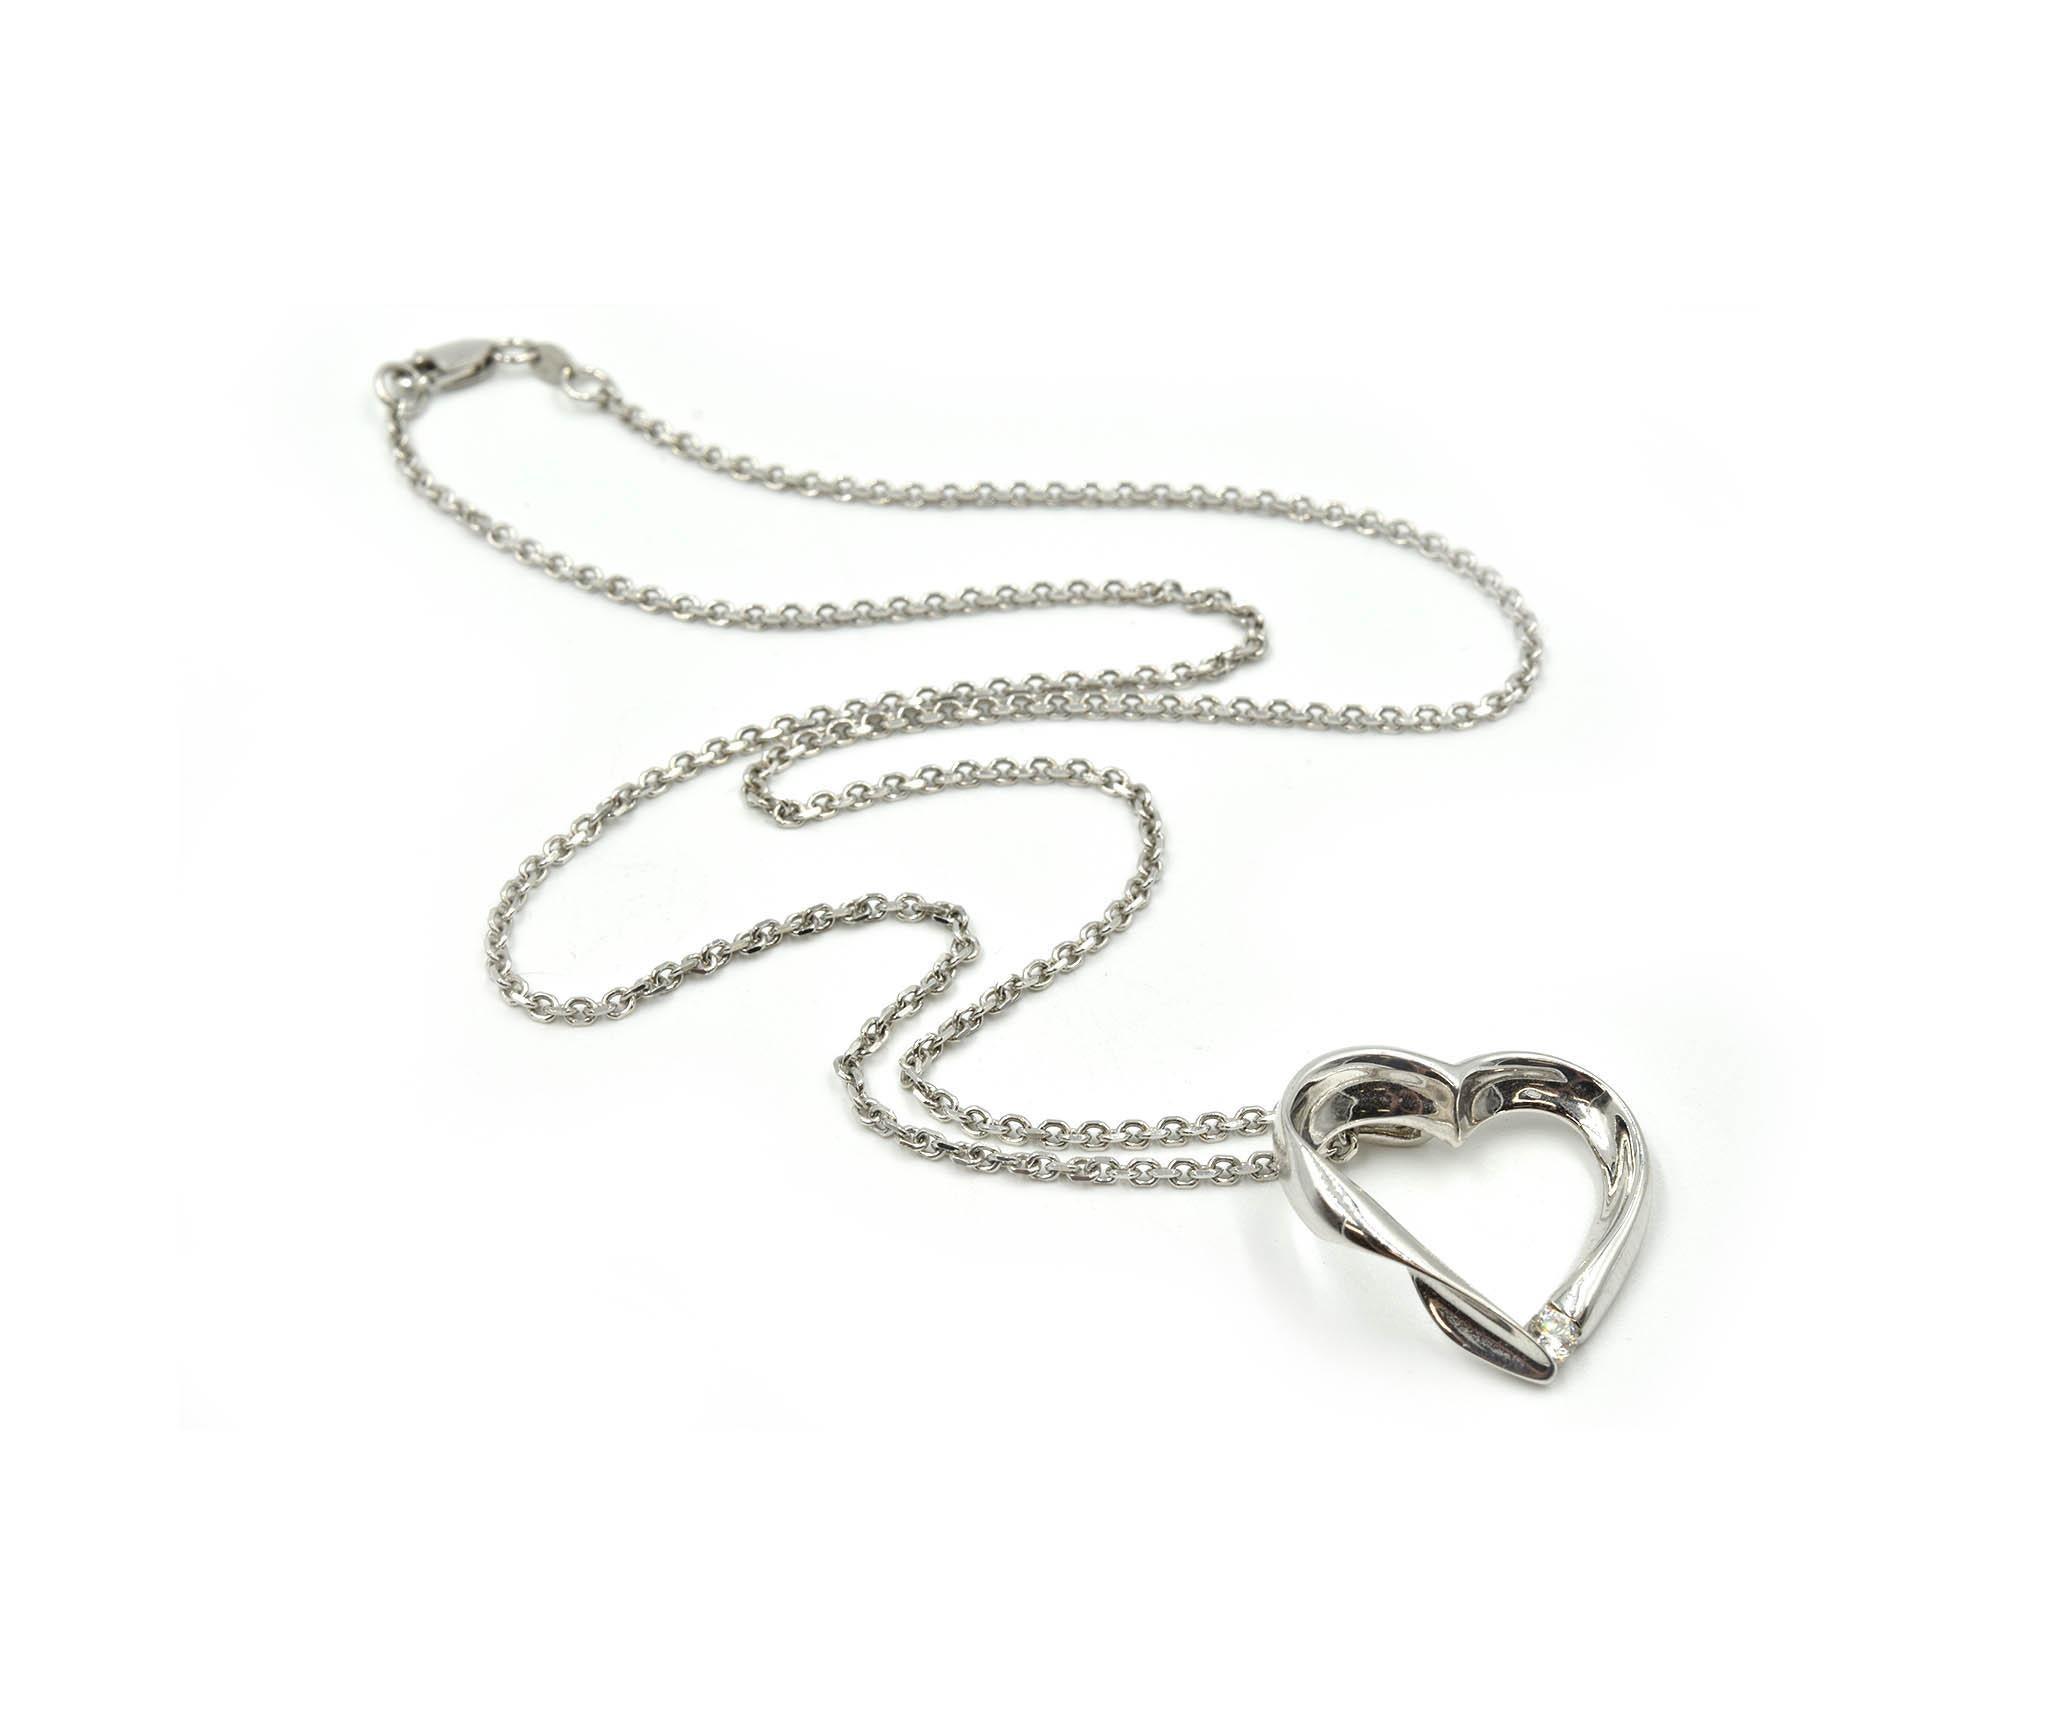 0.10 ct Round Cut Diamond Pave 14k White Gold Heart Charm Pendant Chain Necklace